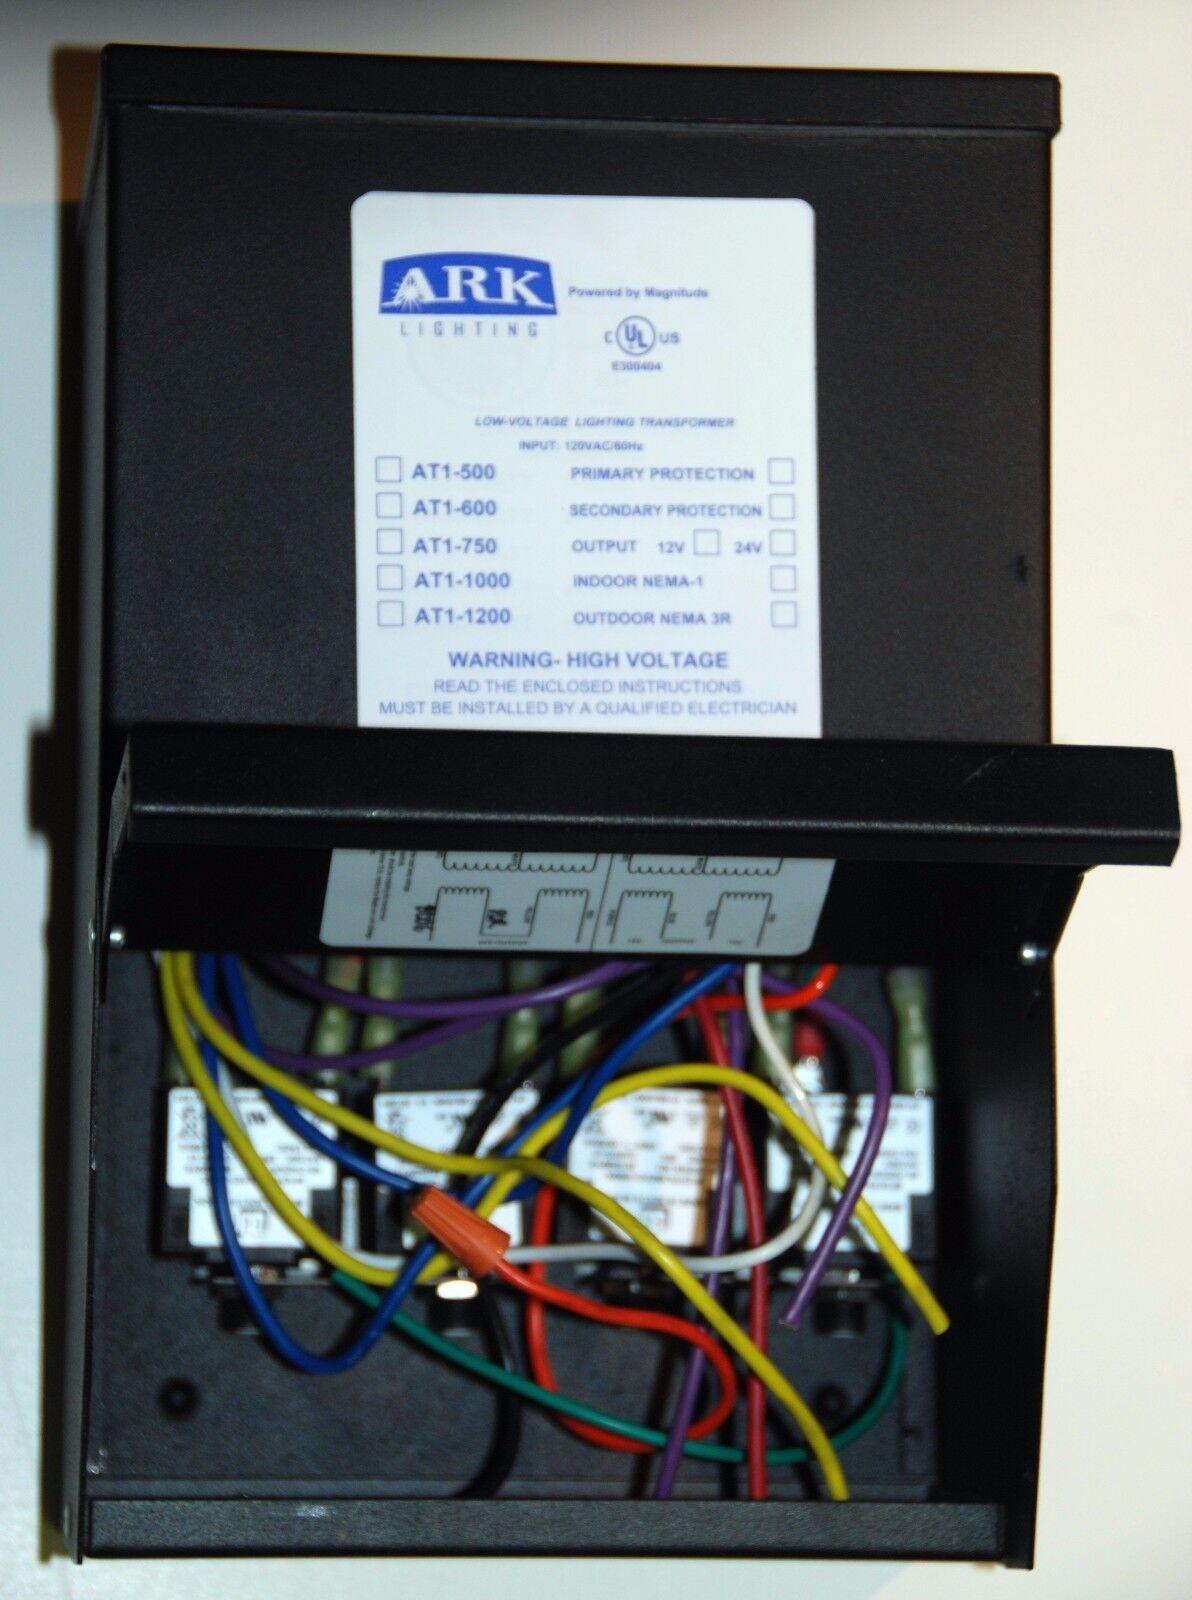 ARK LIGHTING AT-1-150-12R OUTDOOR 150W 120/>12V TRANSFORMER LOW VOLTAGE